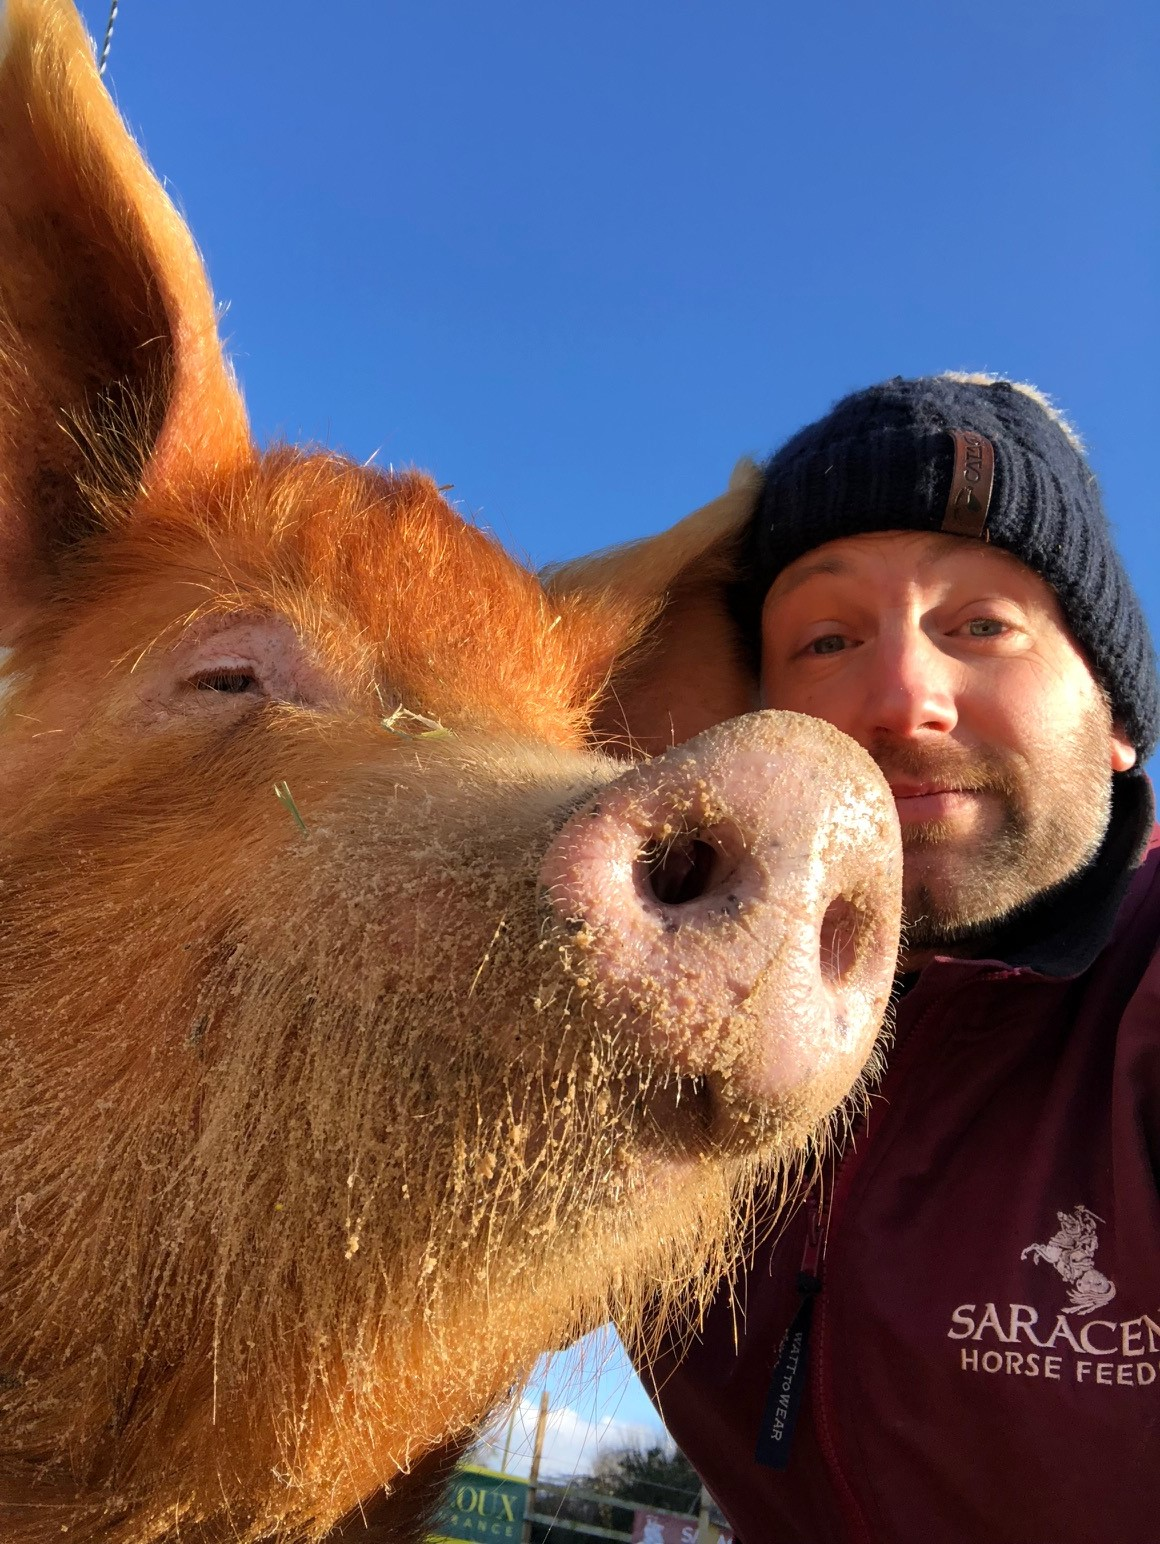 Wayne Garrick gives us a winter Blog and an insight to his life!